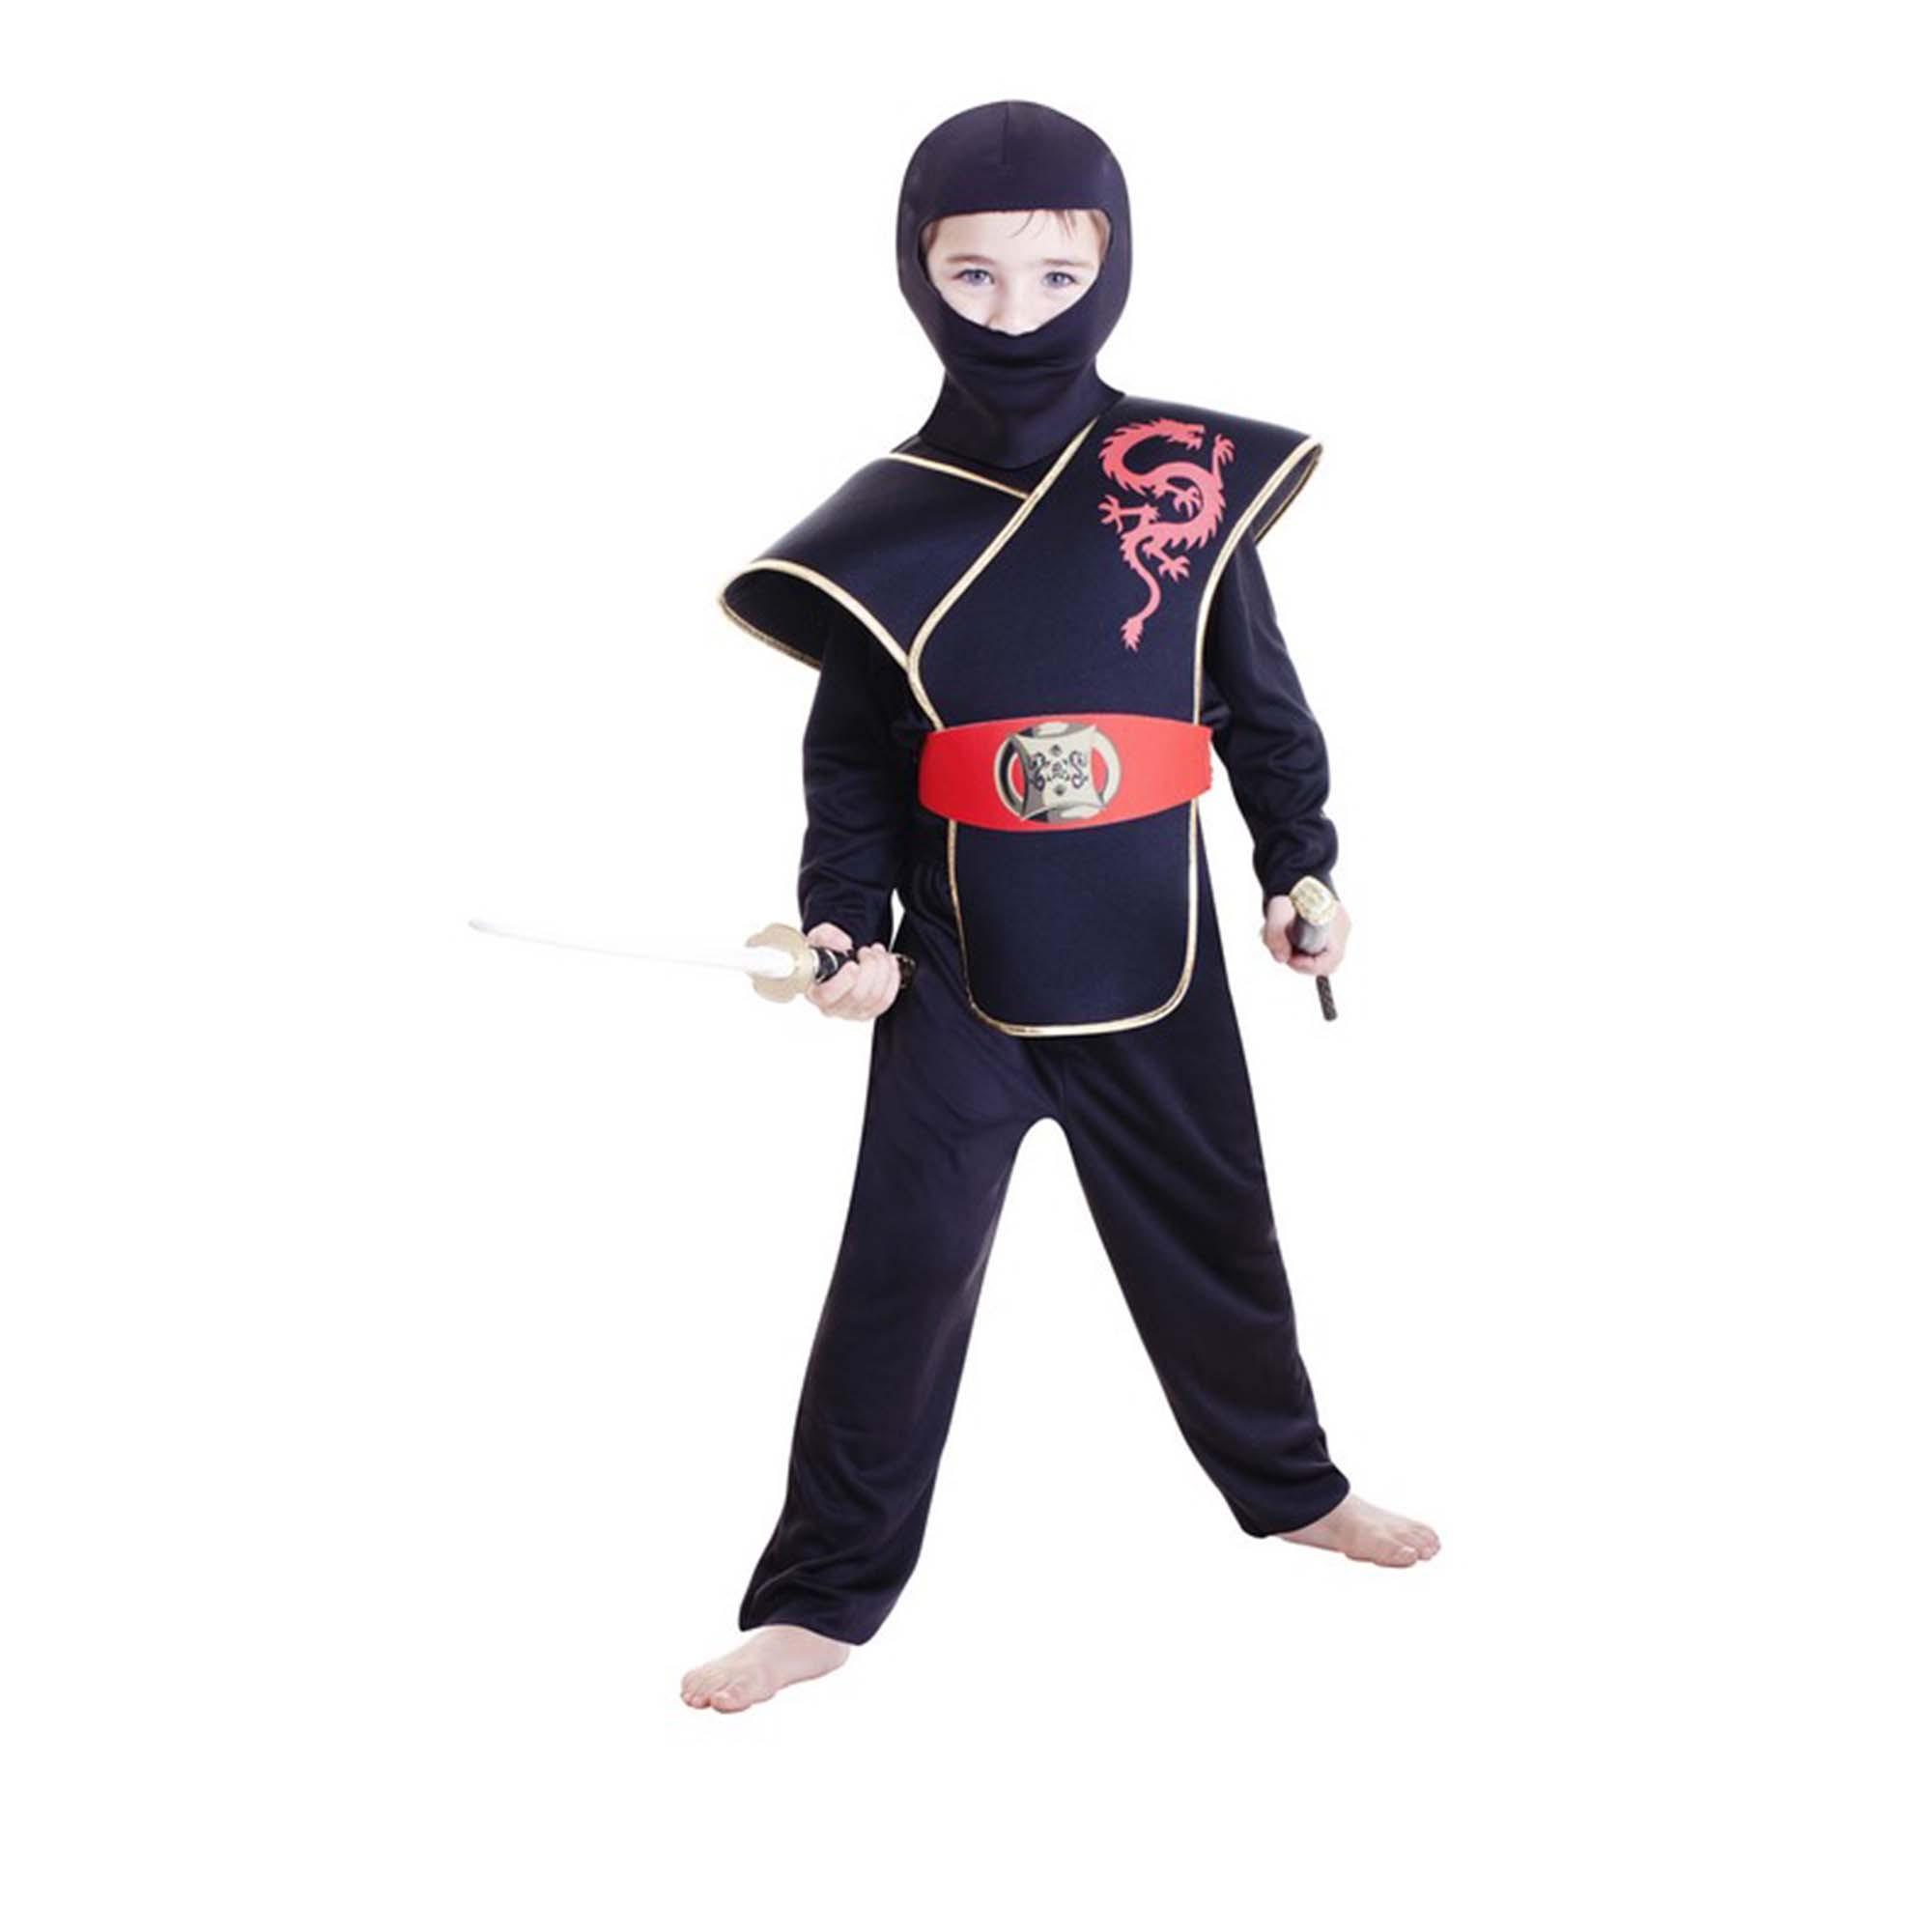 Deluxe Ninja Boy Costume (Small) 3-5 yrs